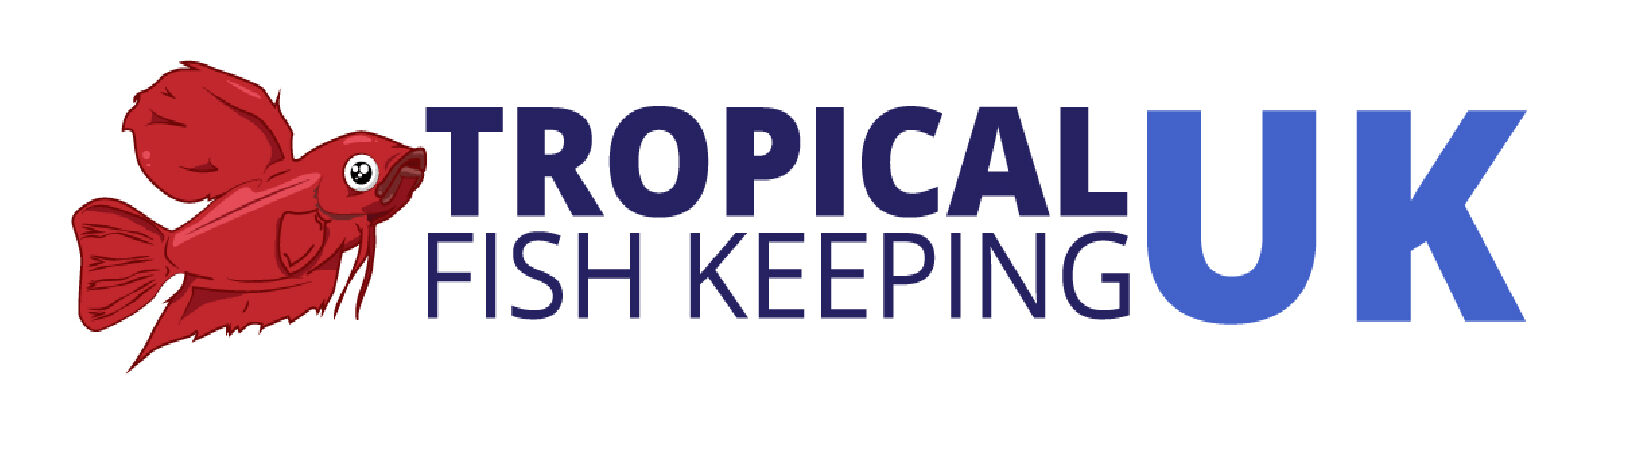 Tropical Fish Keeping UK